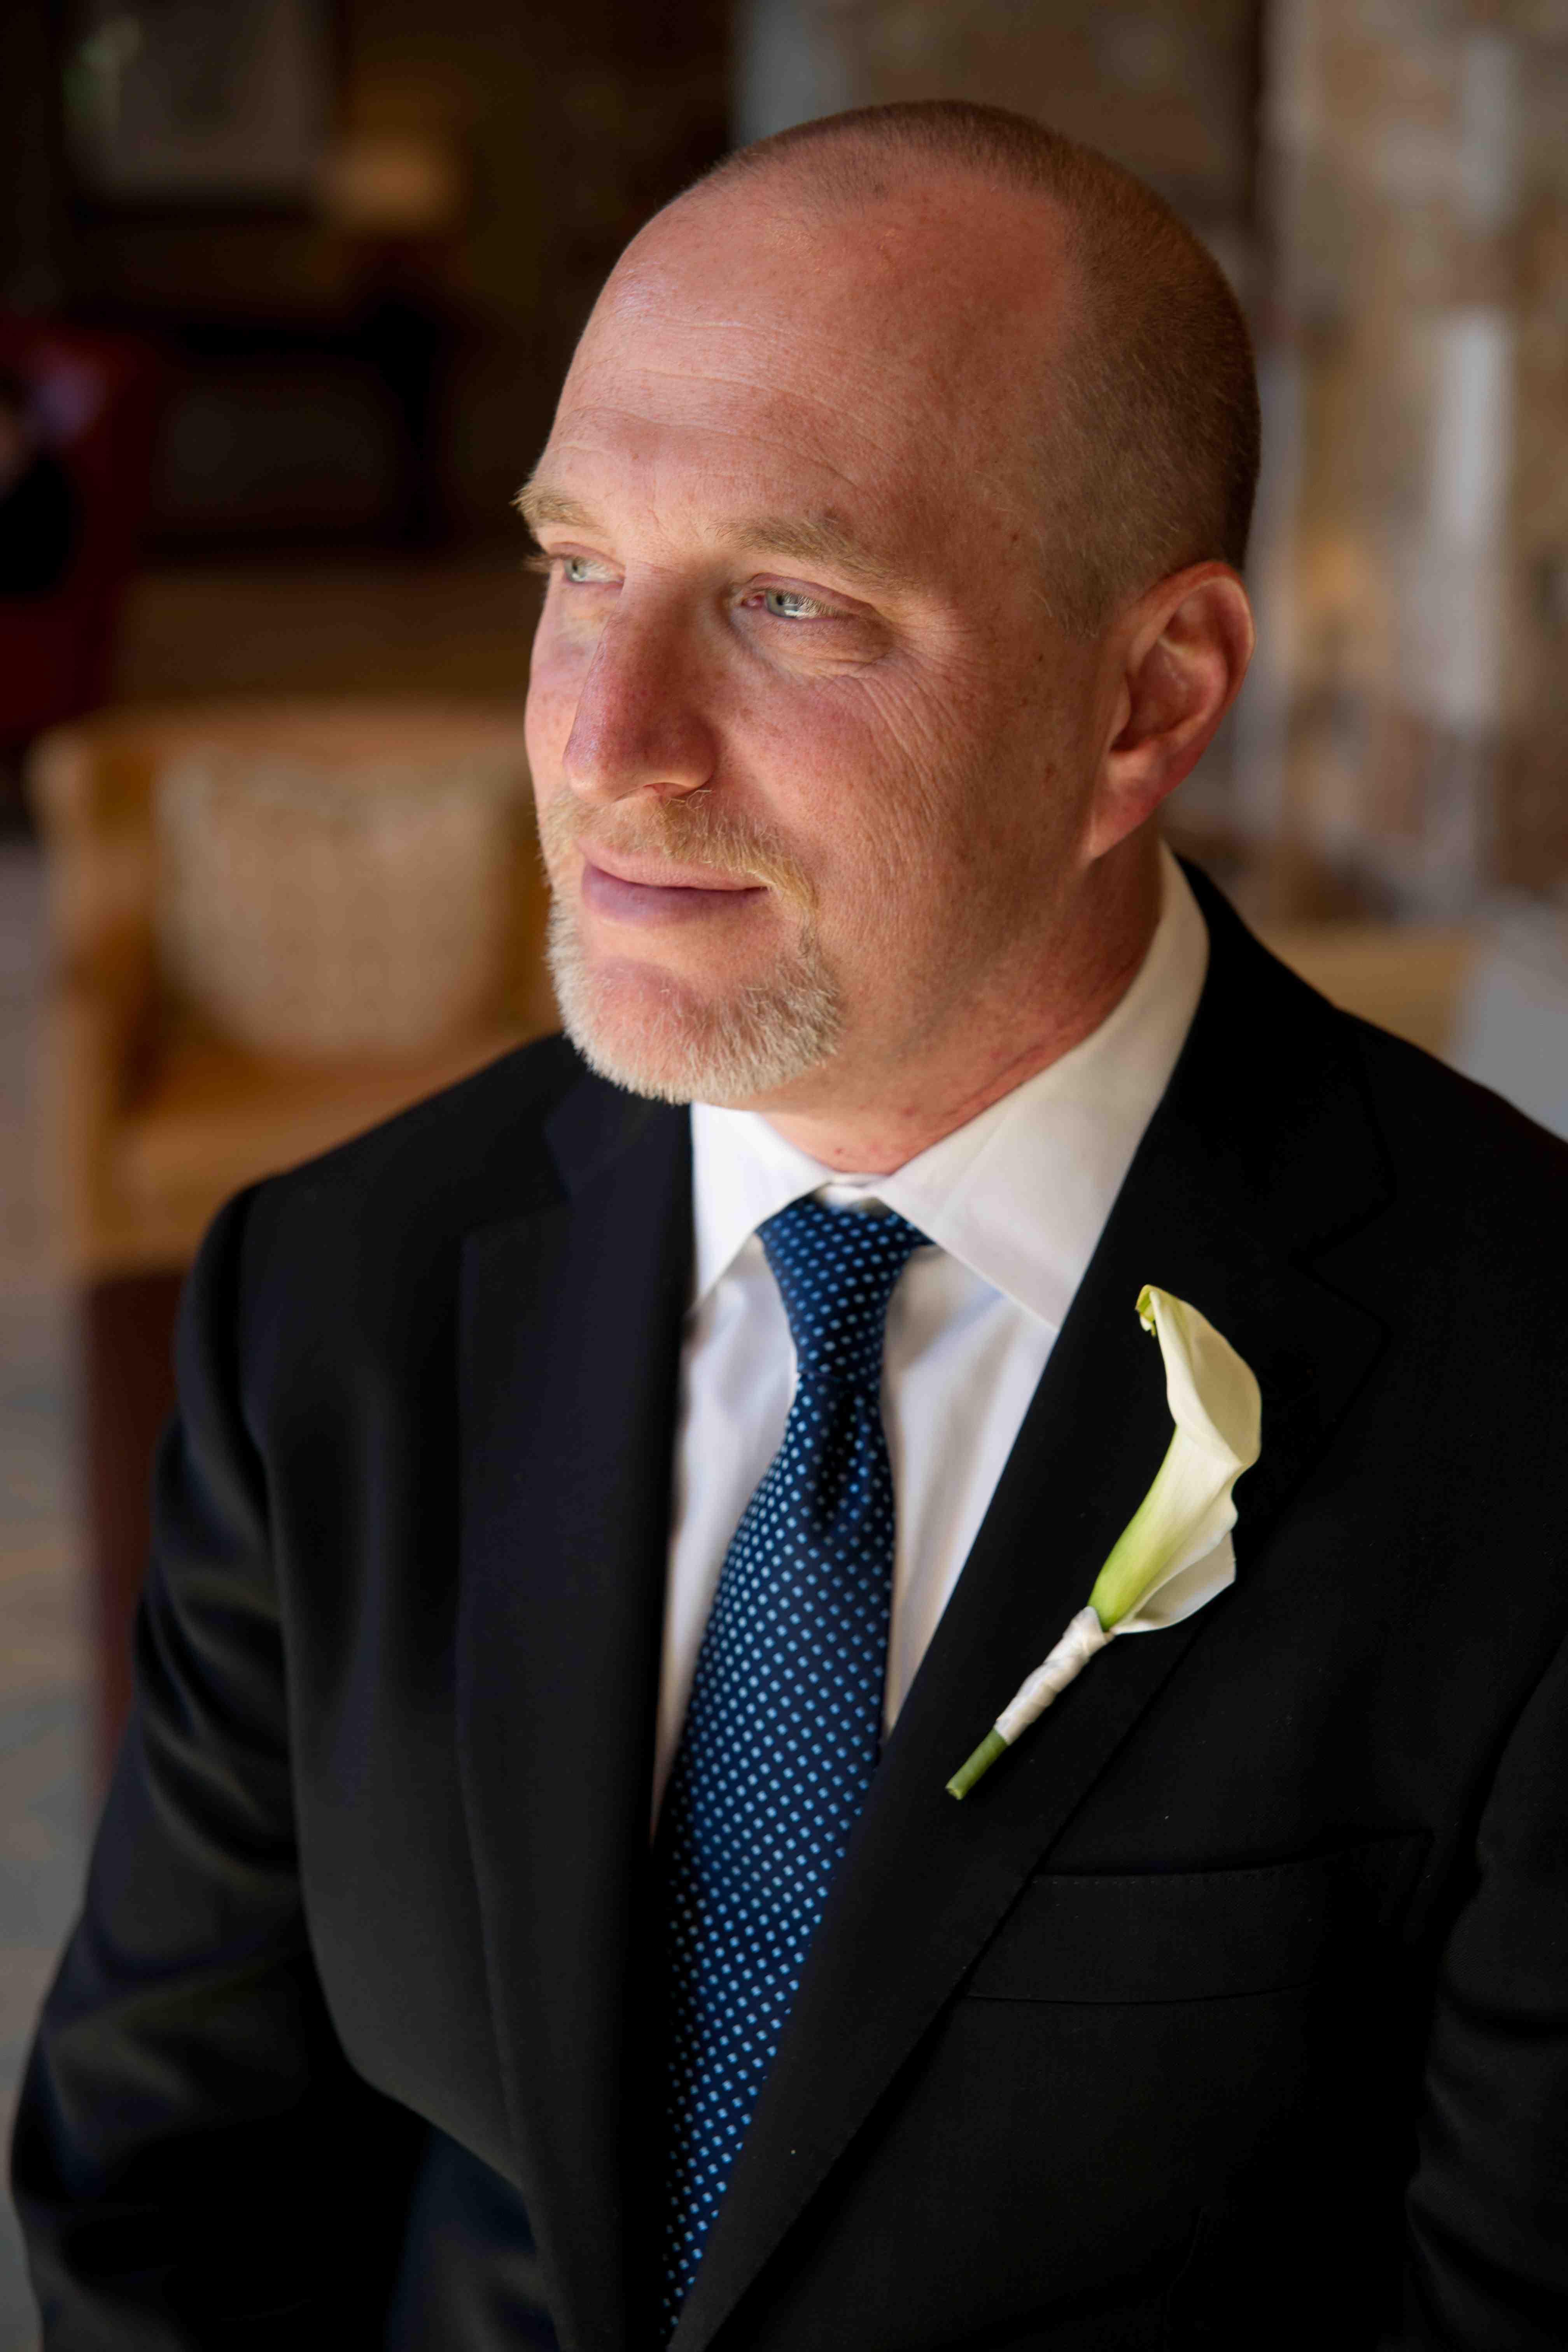 groom blue and white polka dot tie